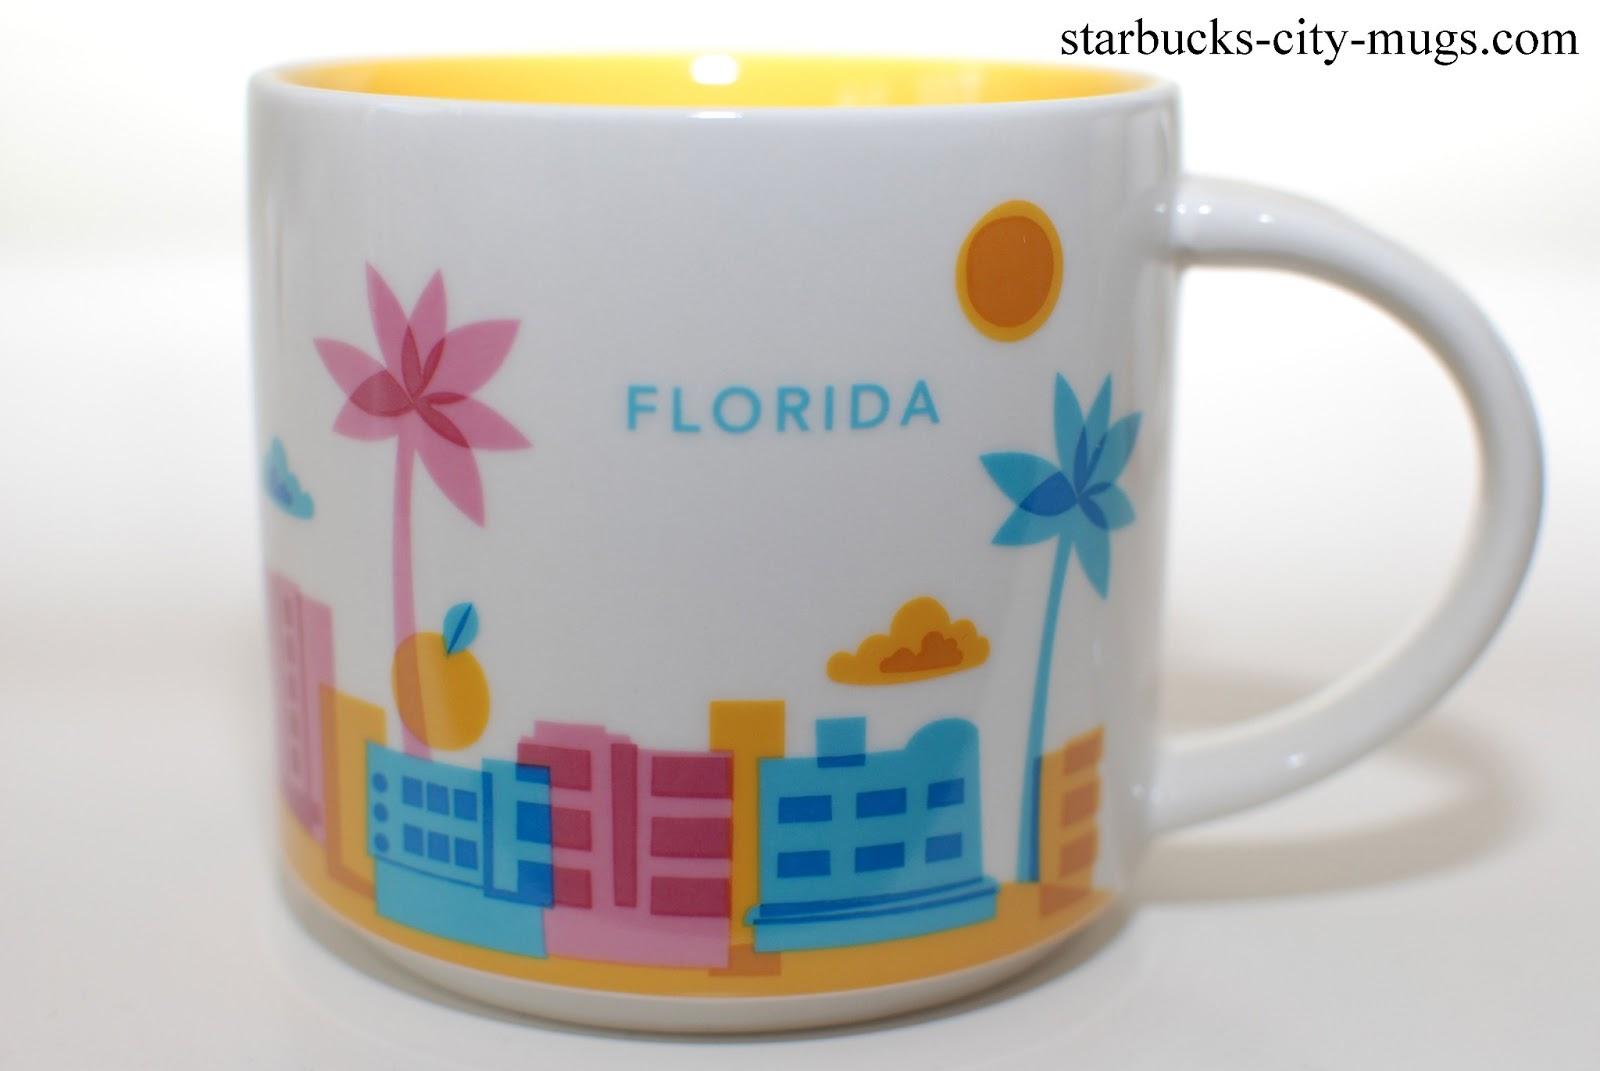 Starbucks City Mugs: Florida You Are Here